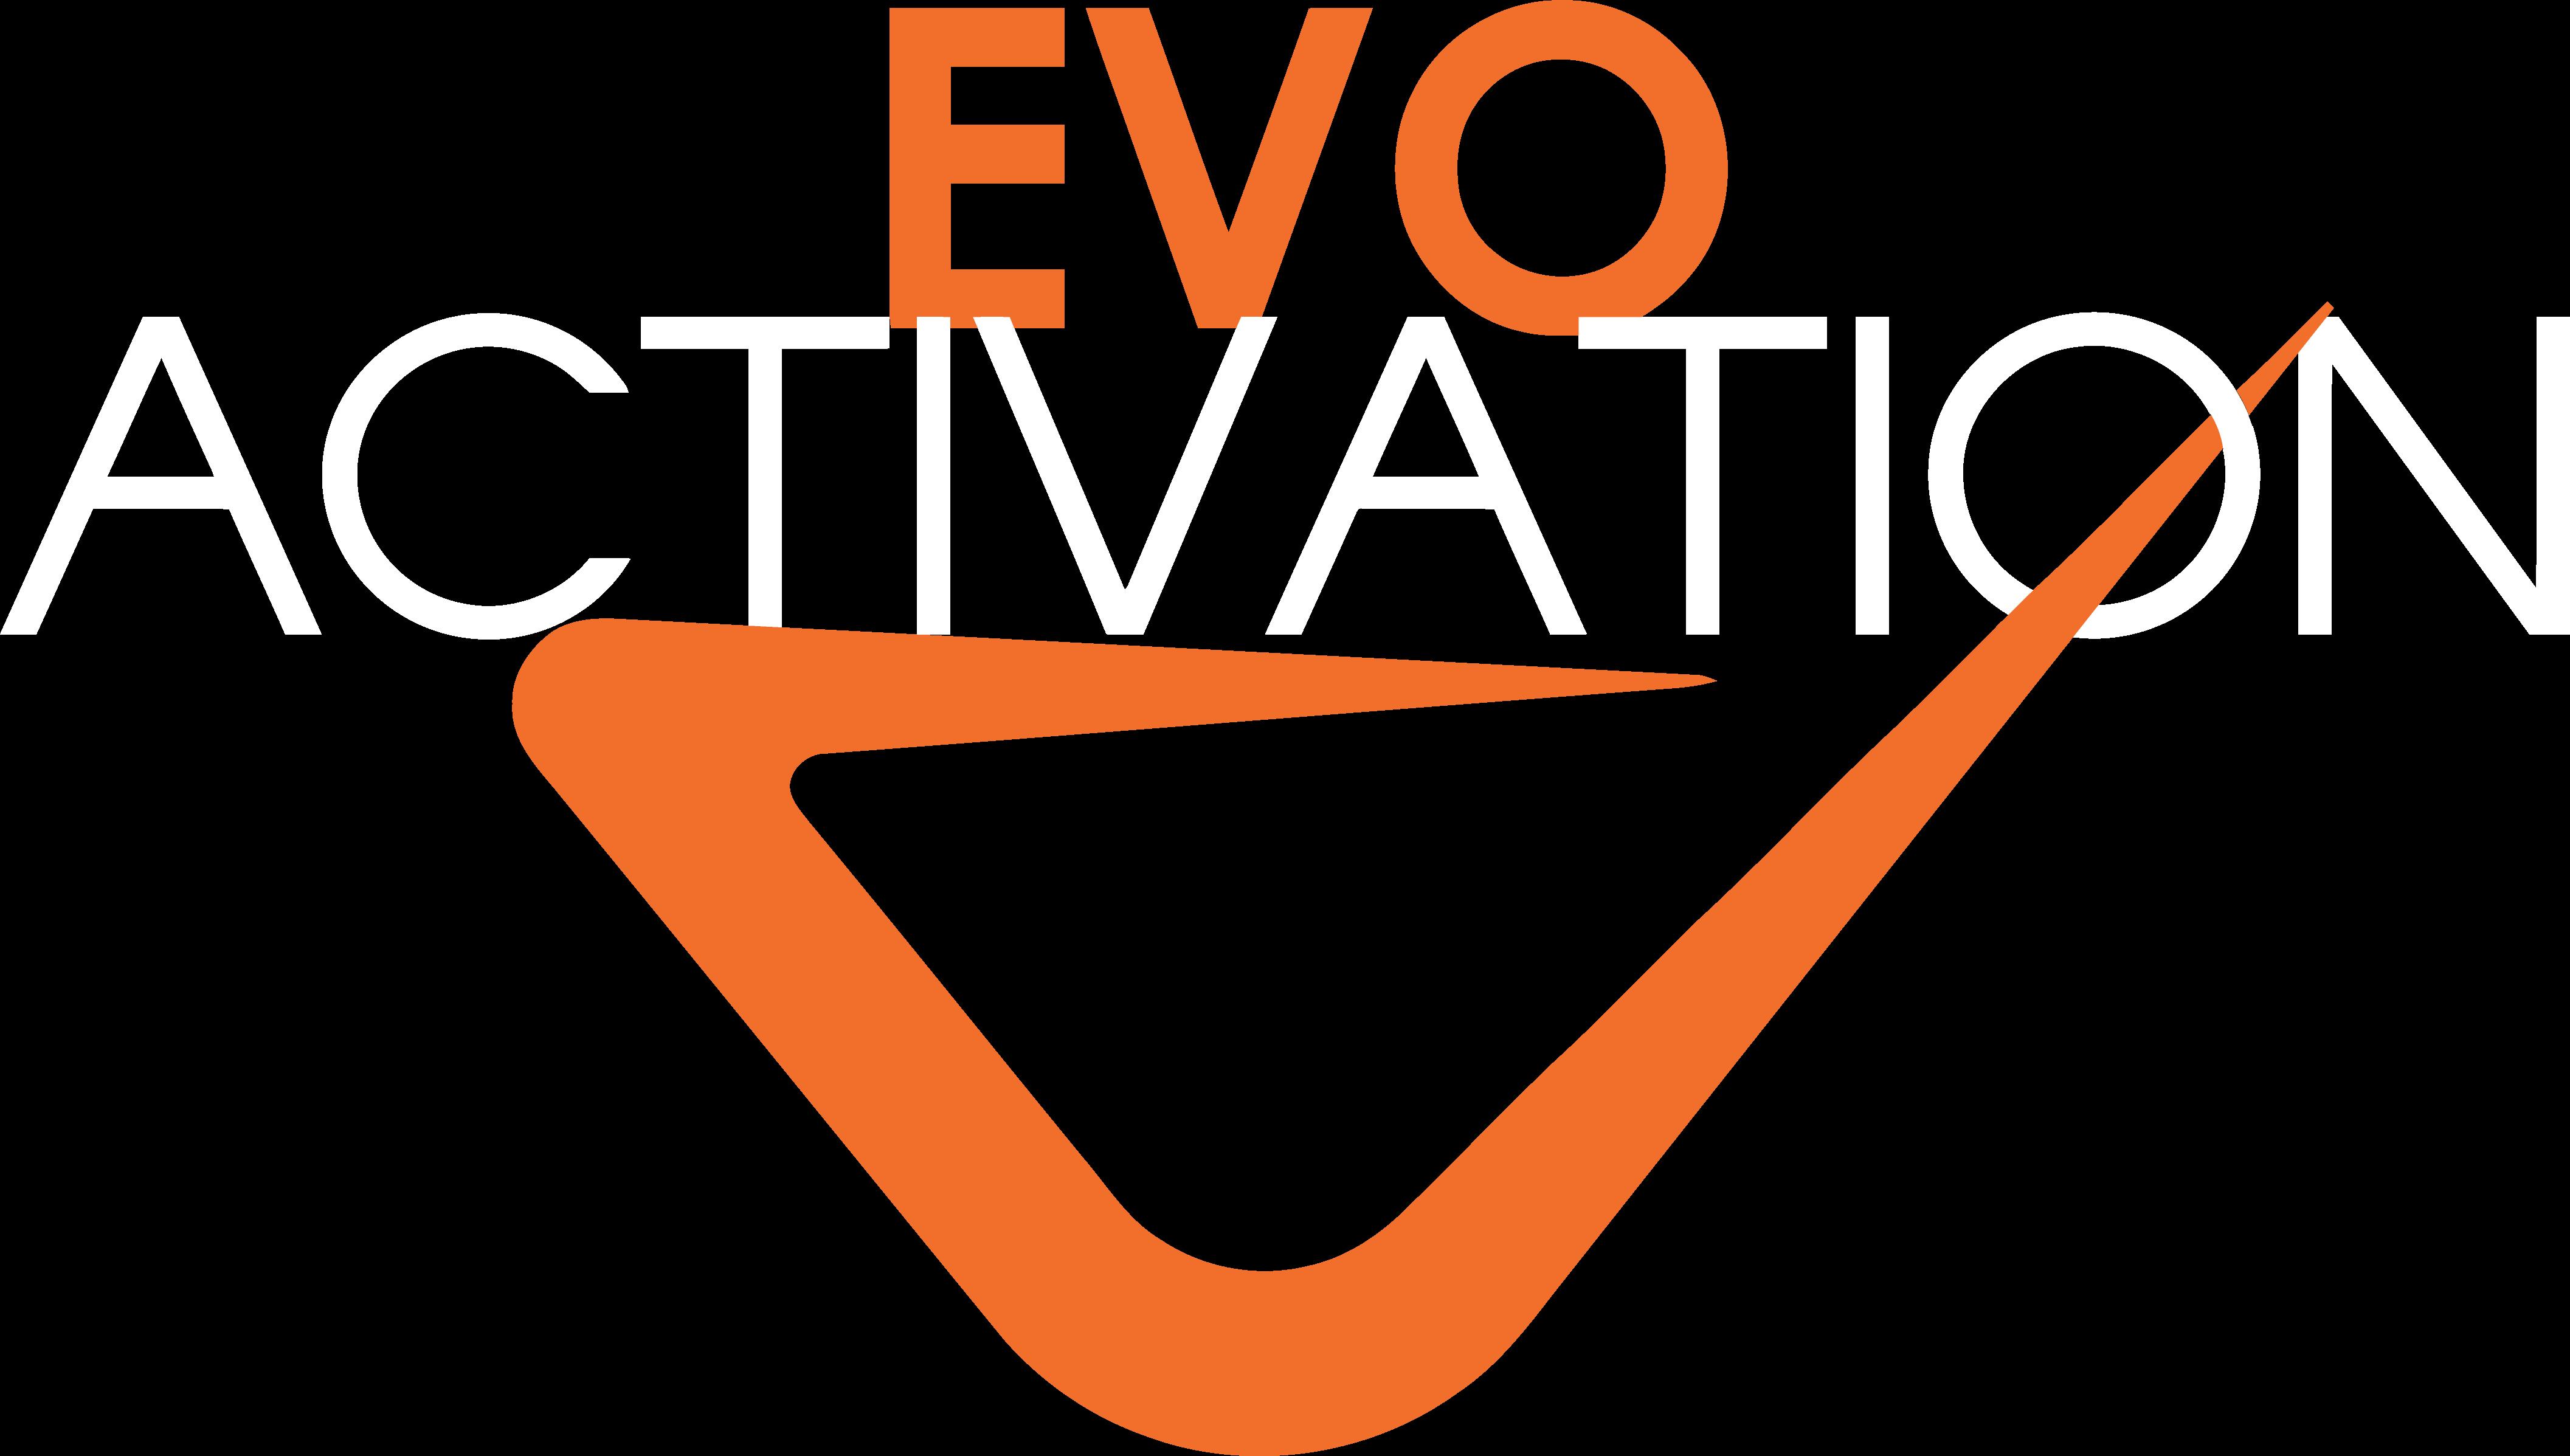 Evoactivation - English